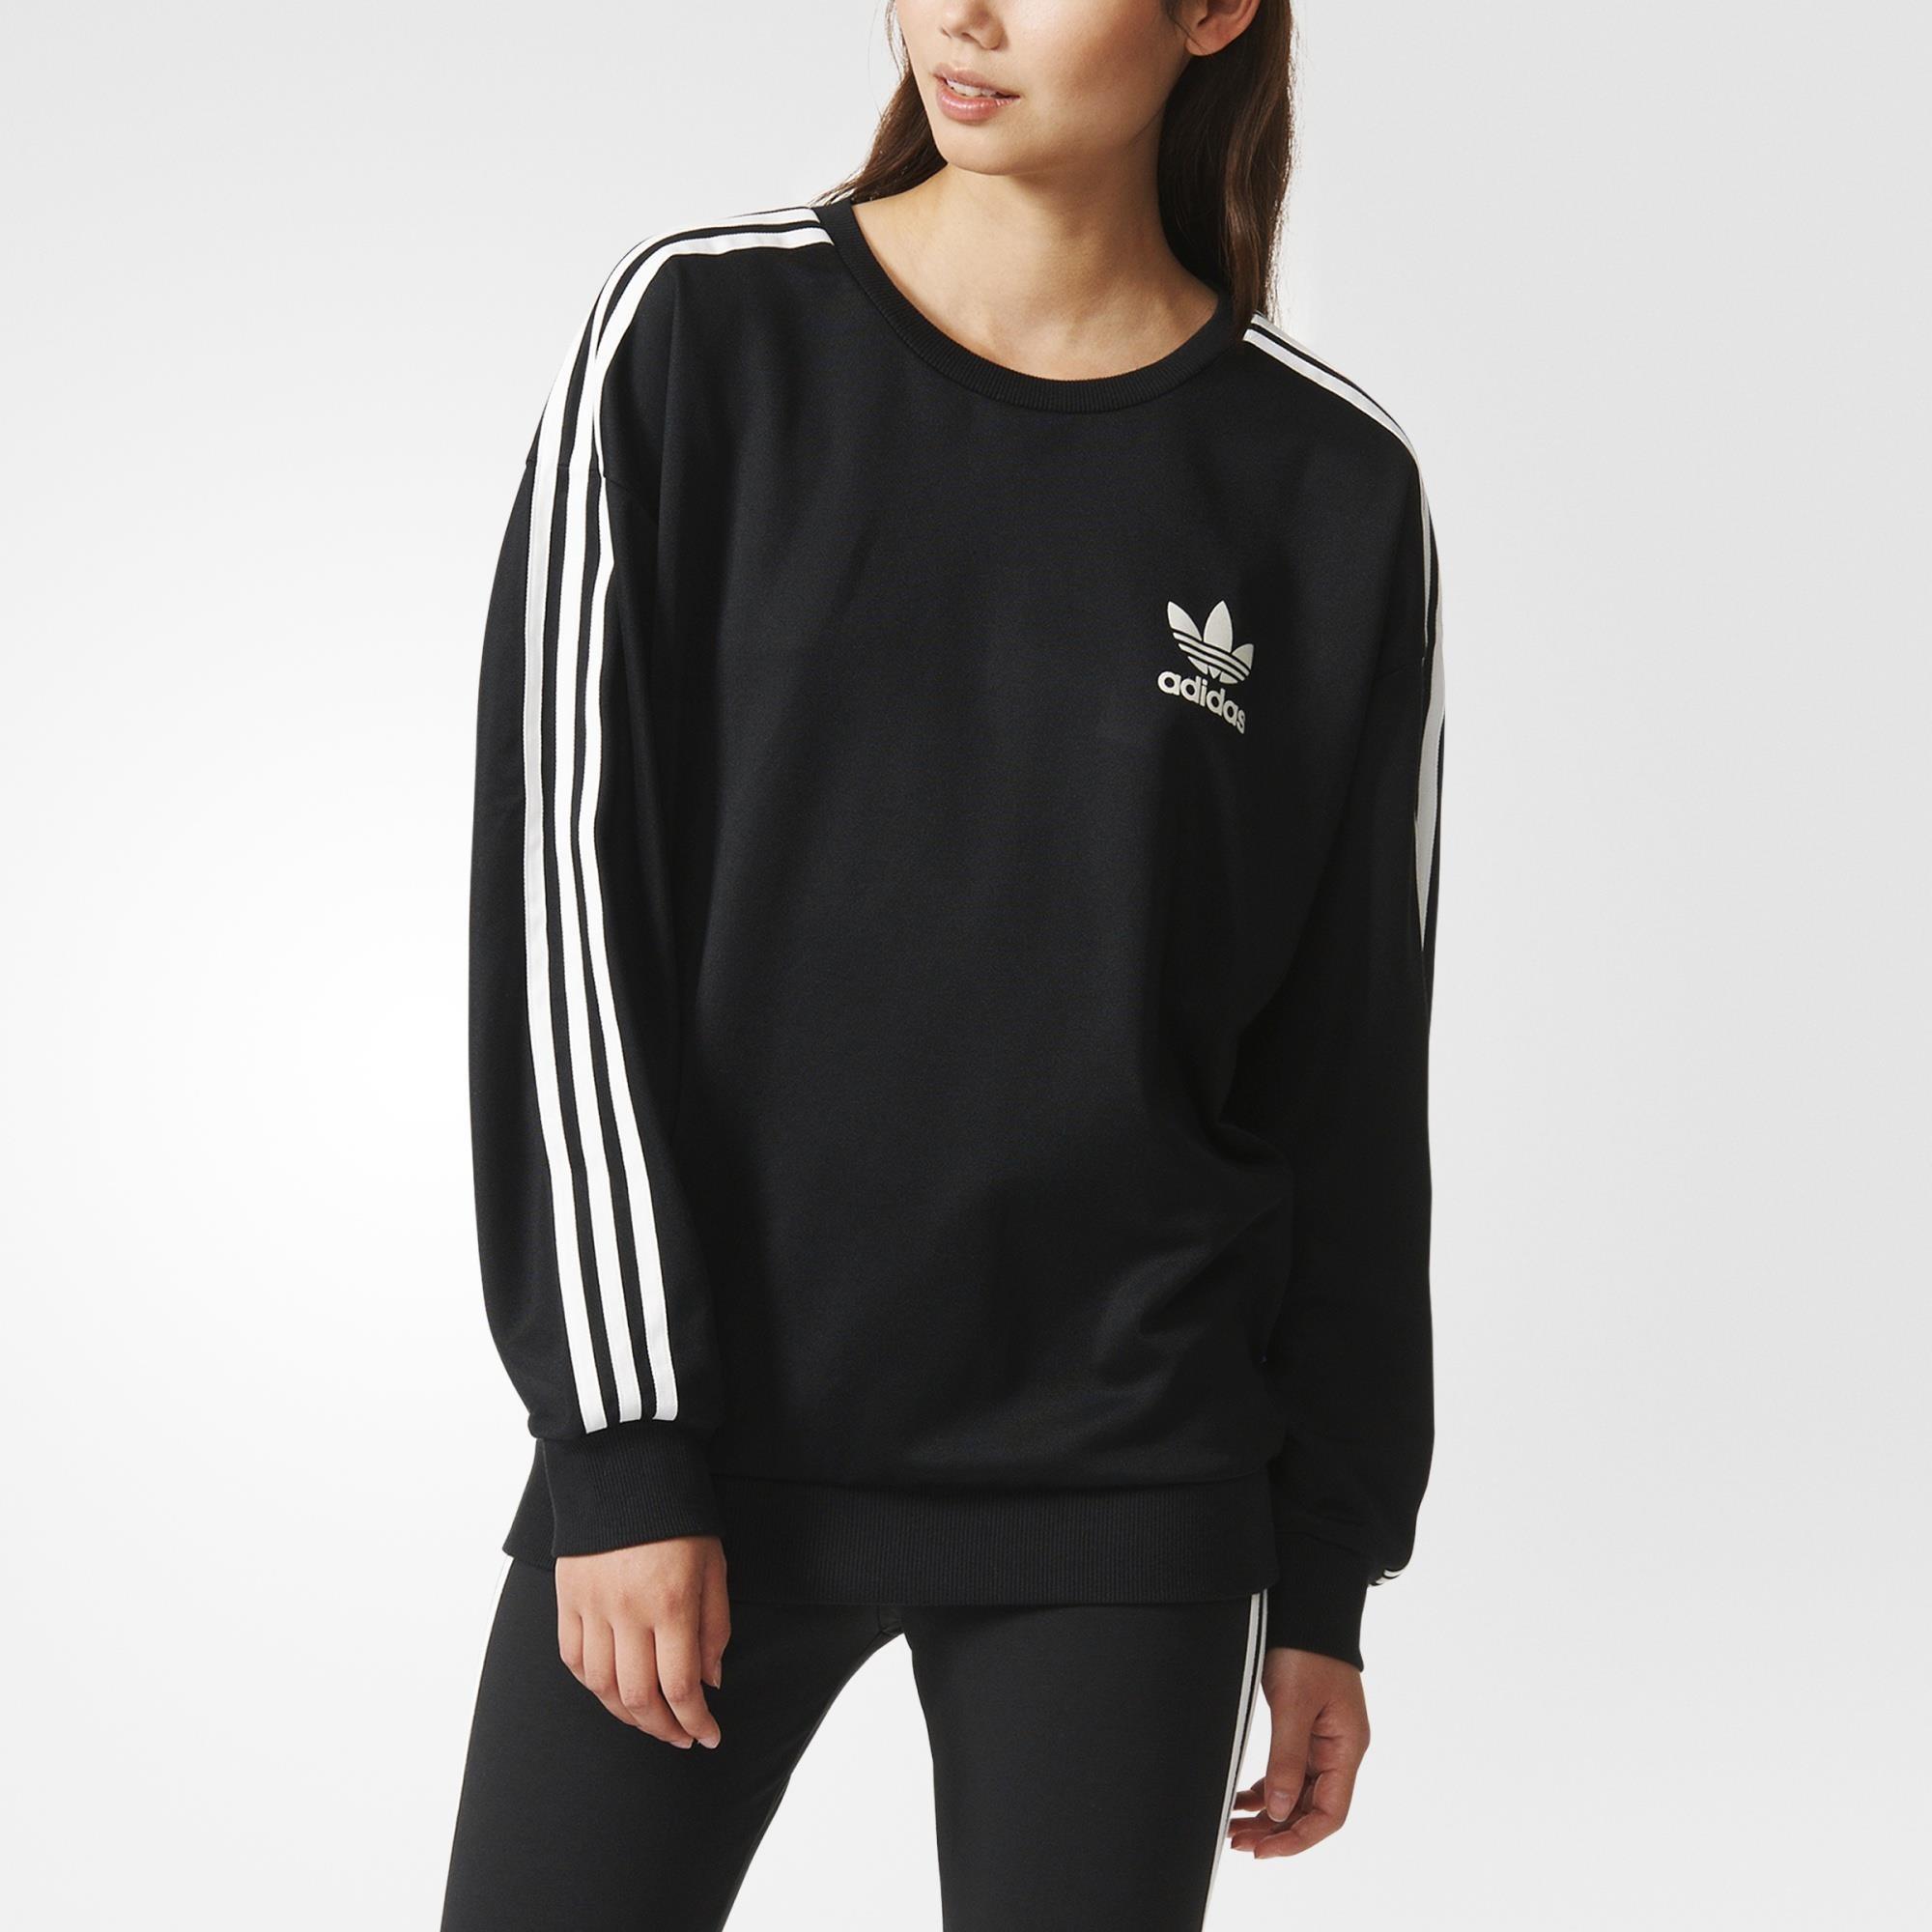 Adidas Beckenbauer Sweatshirt Black Adidas Us